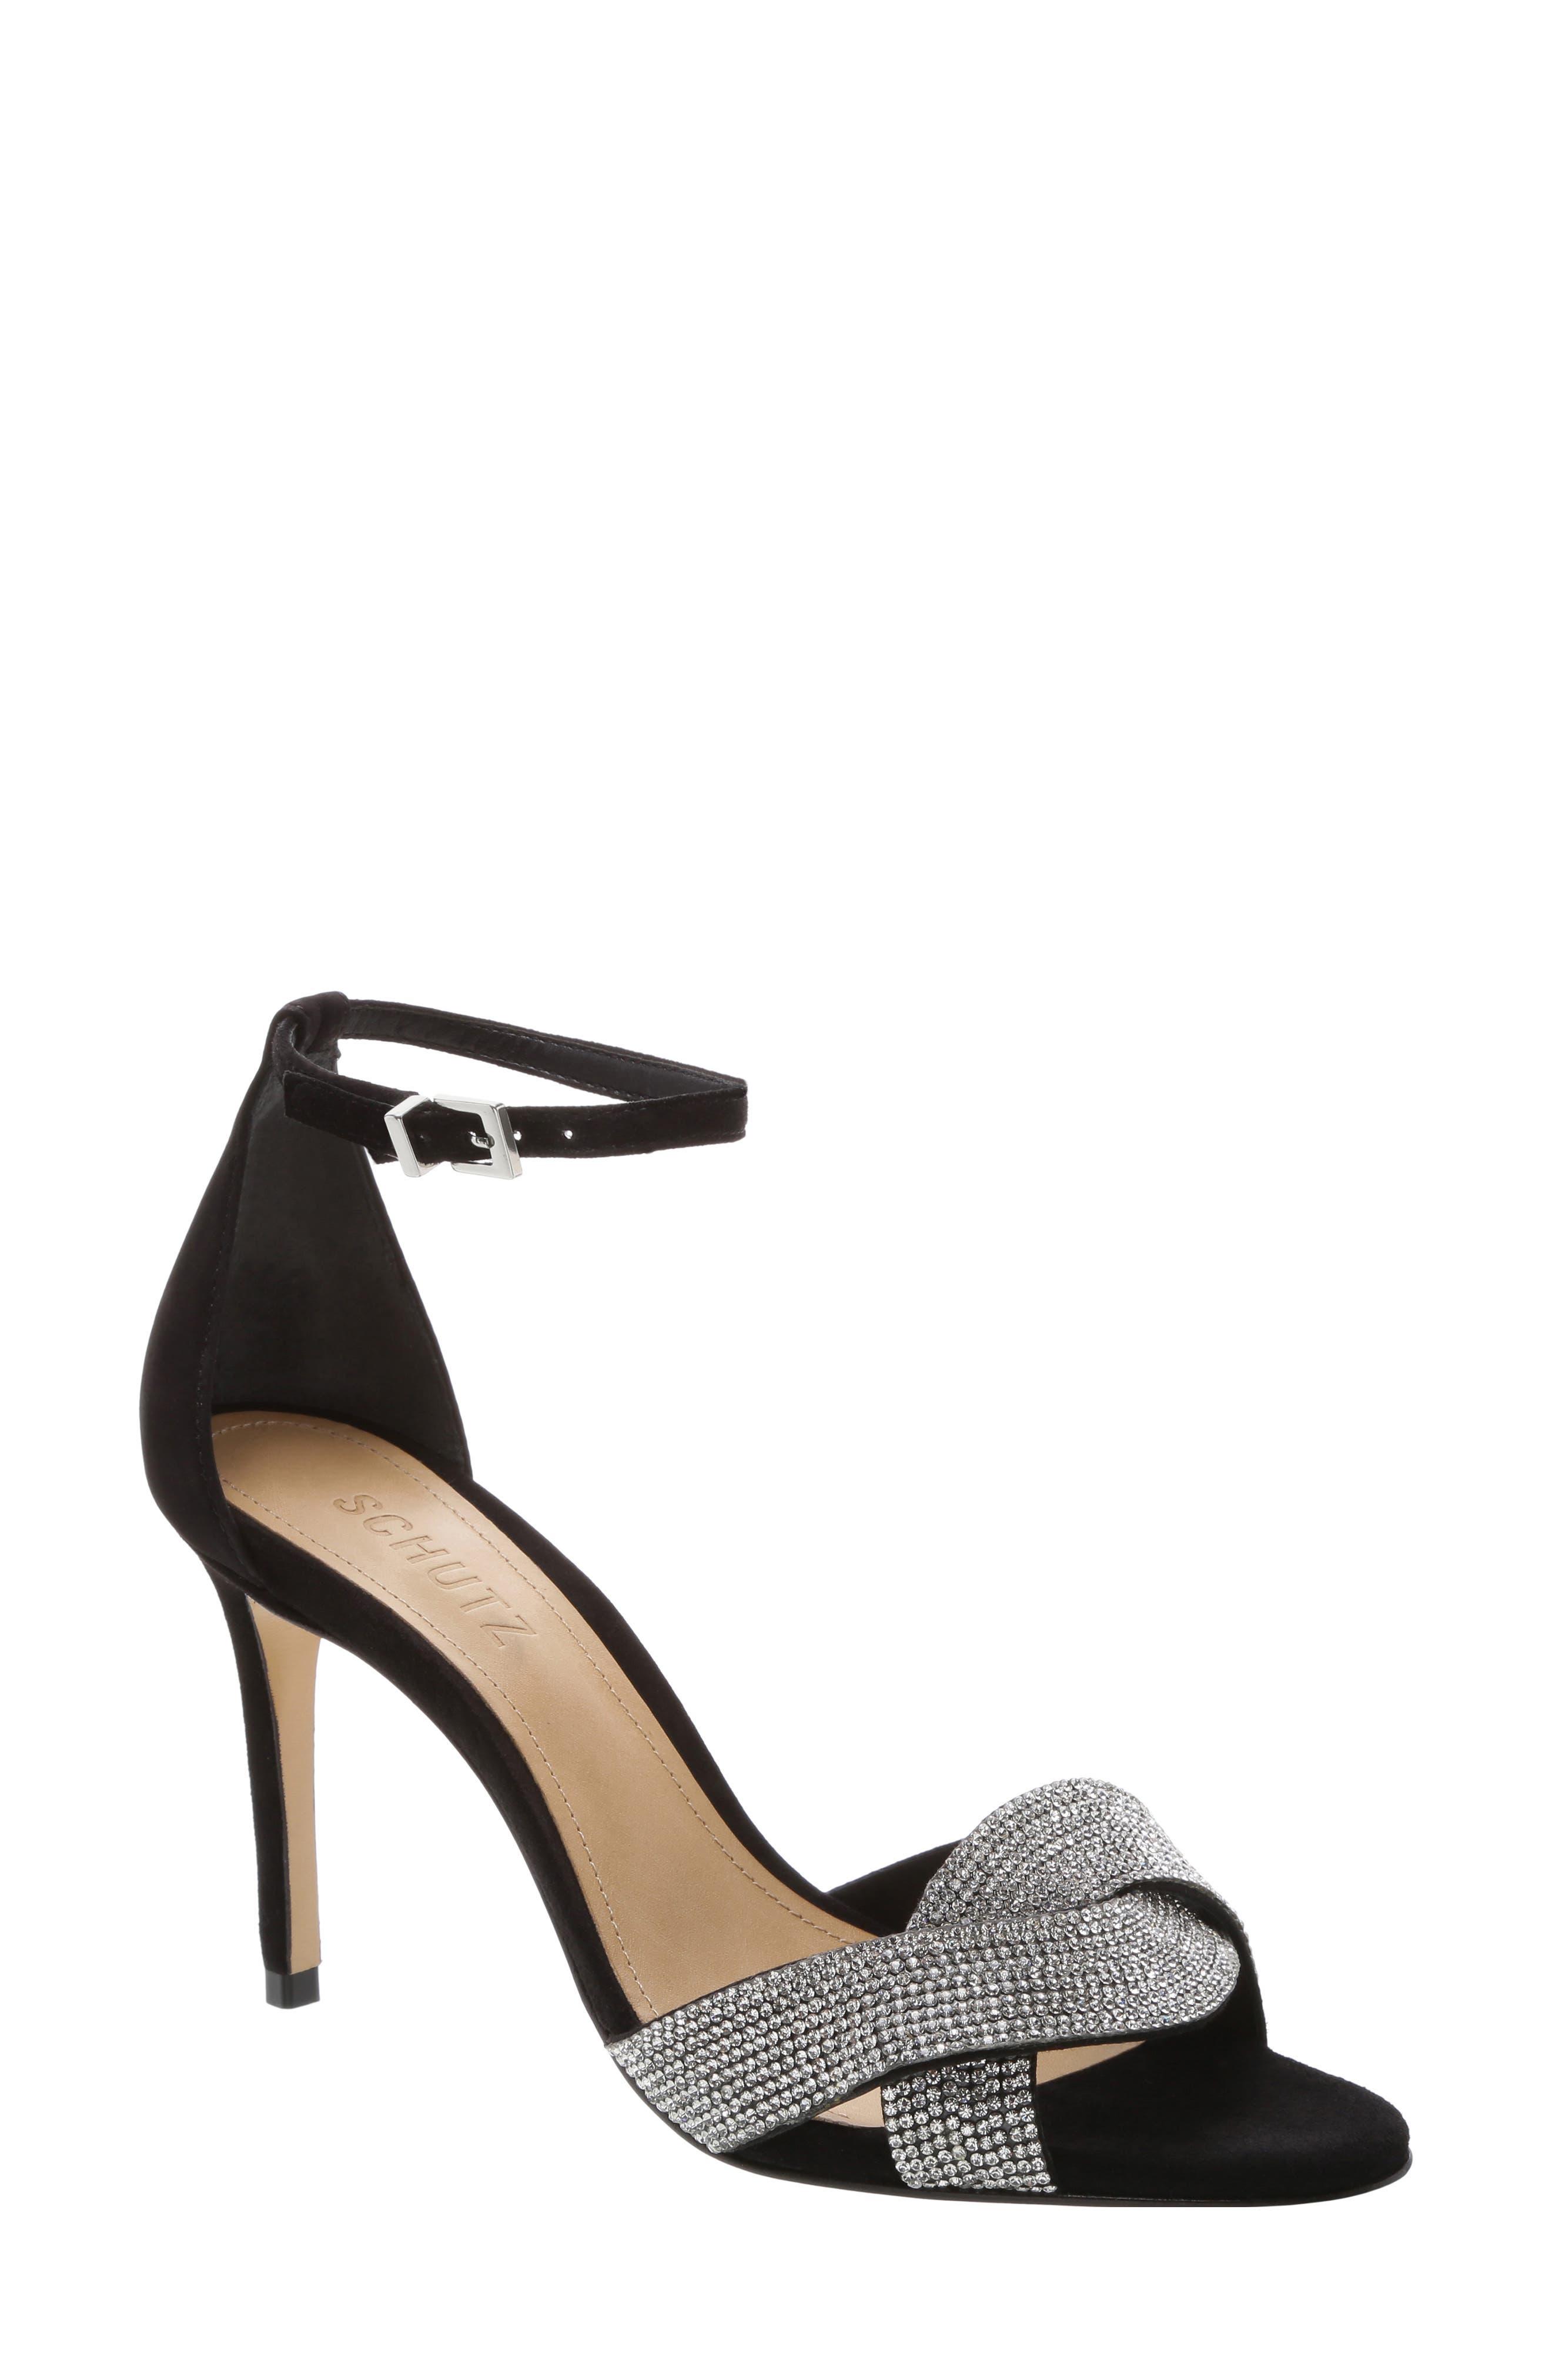 Schutz Jolita Ankle Strap Sandal, Black